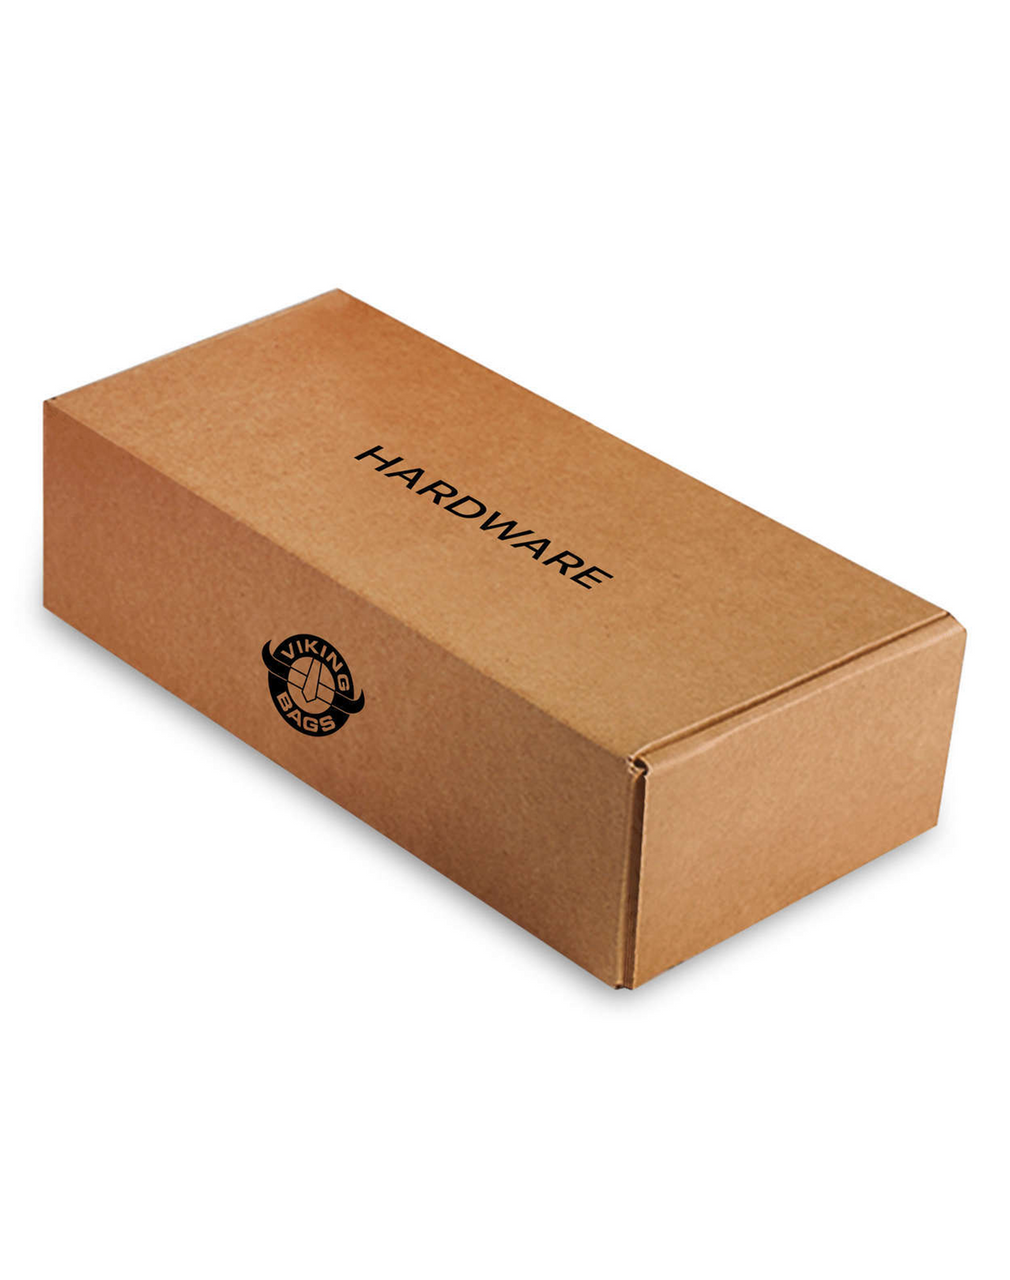 Triumph Rocket III Roadster Side Pocket Motorcycle Saddlebags Box